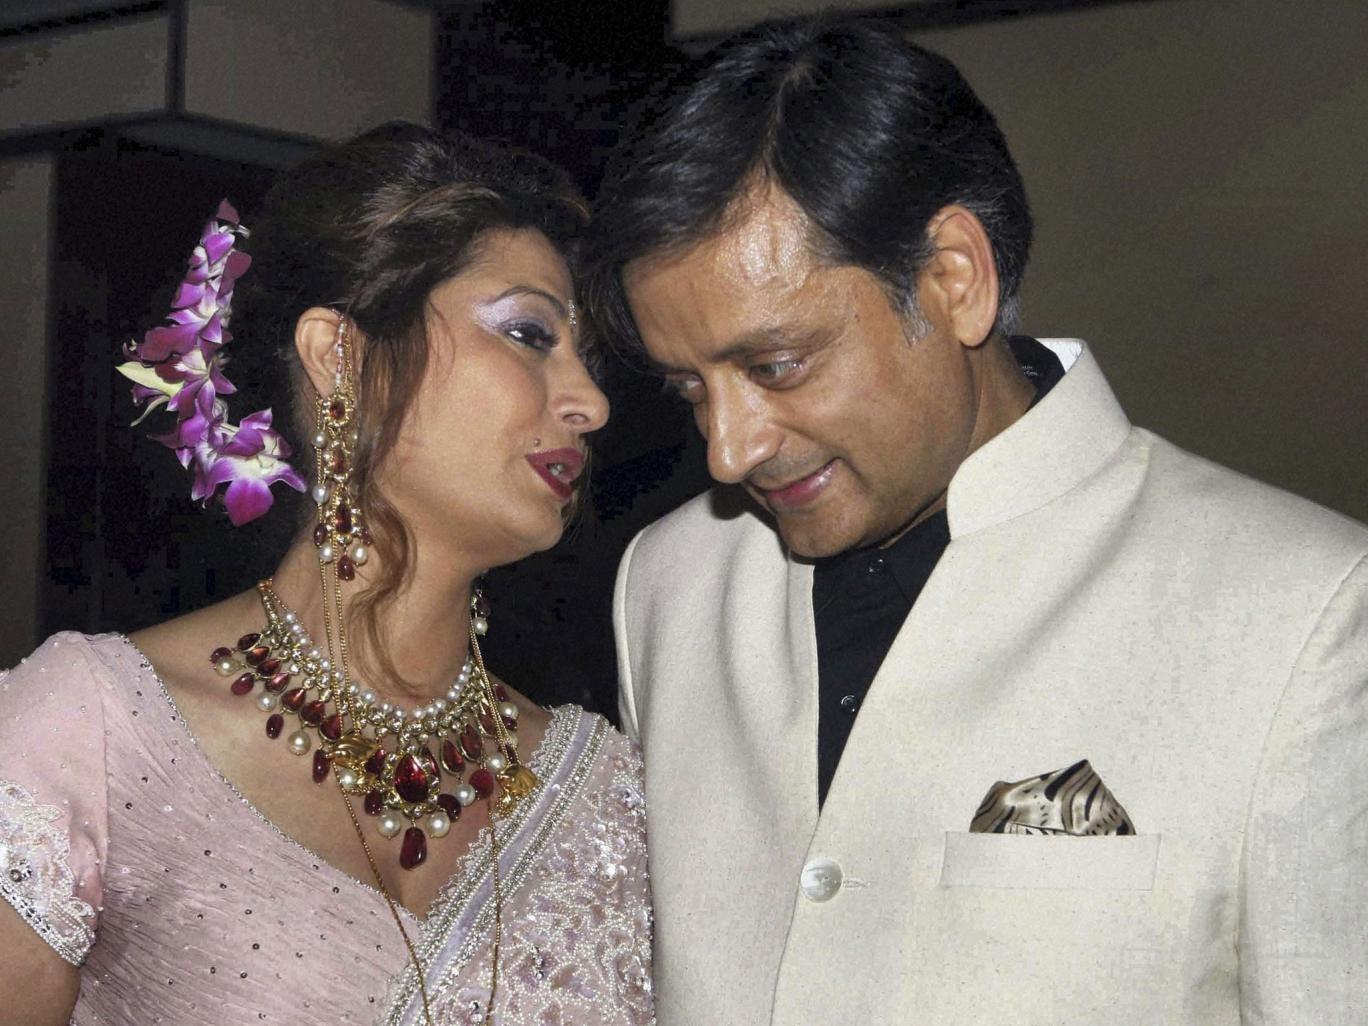 Shashi Tharoor and his wife Sunanda Pushkar at their wedding reception in New Delhi in 2010